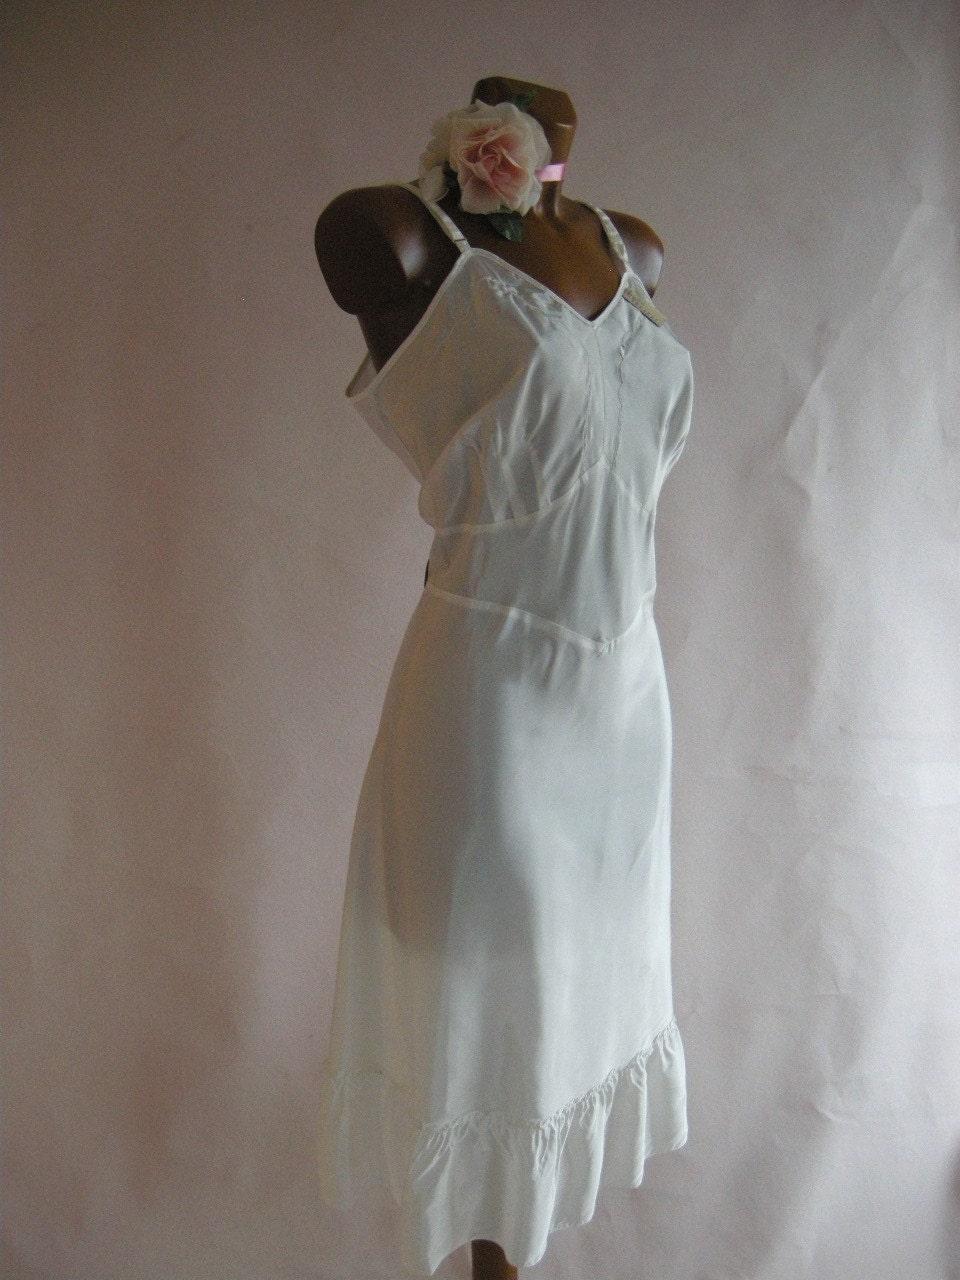 SWISHY White Ruffled Vintage 40s Full Slip 40 Bust by empressjade from etsy.com